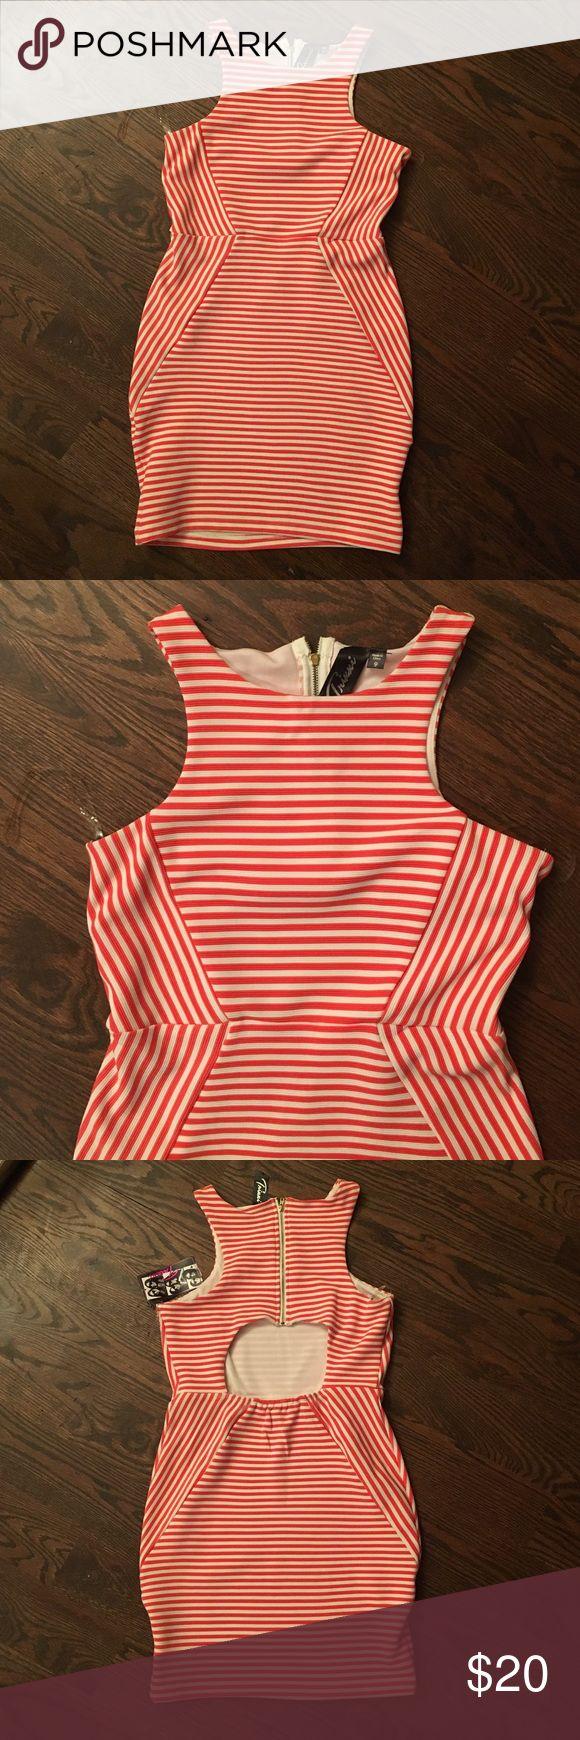 Striped mini dress by Trixxi size 9 Trixxi mini dress with cutout back. Size 9. Gold zipper in back. Trixxi Dresses Mini